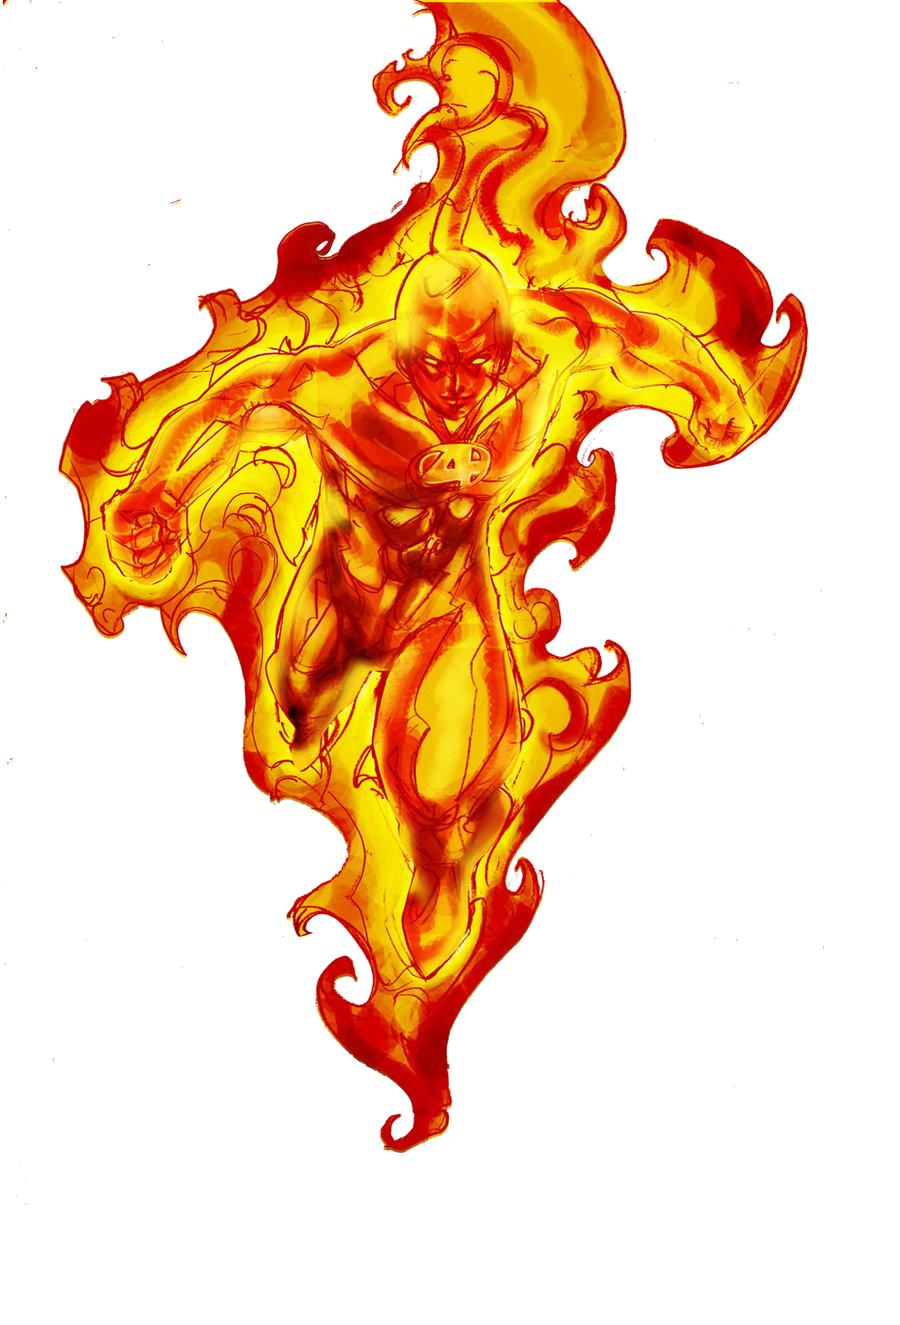 Human Torch Transparent PNG Image